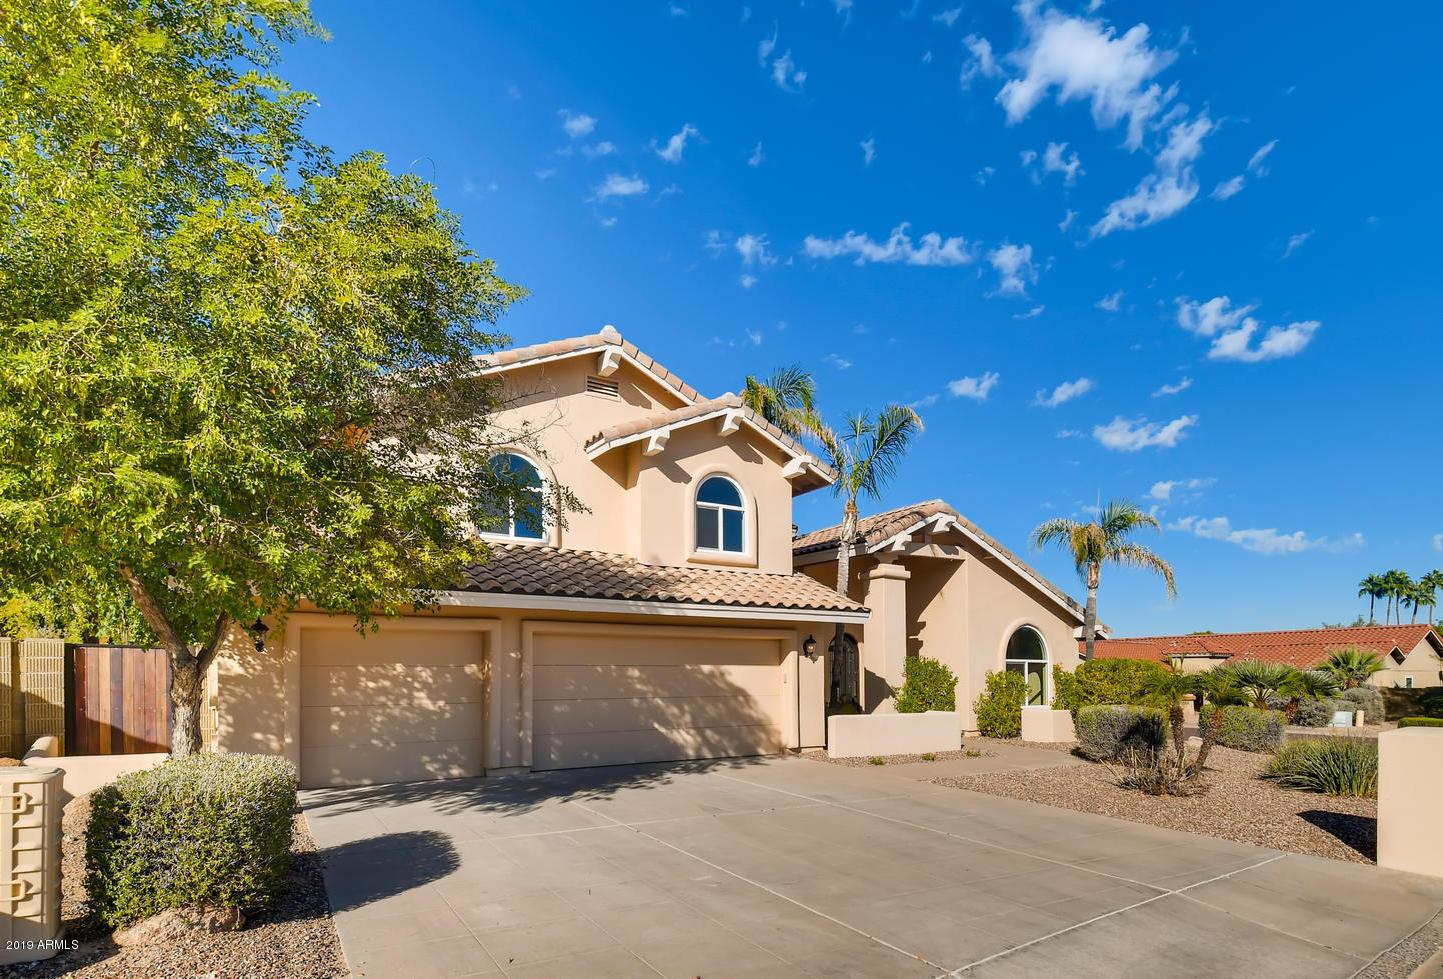 Photo of 3740 E CHEROKEE Court, Phoenix, AZ 85044